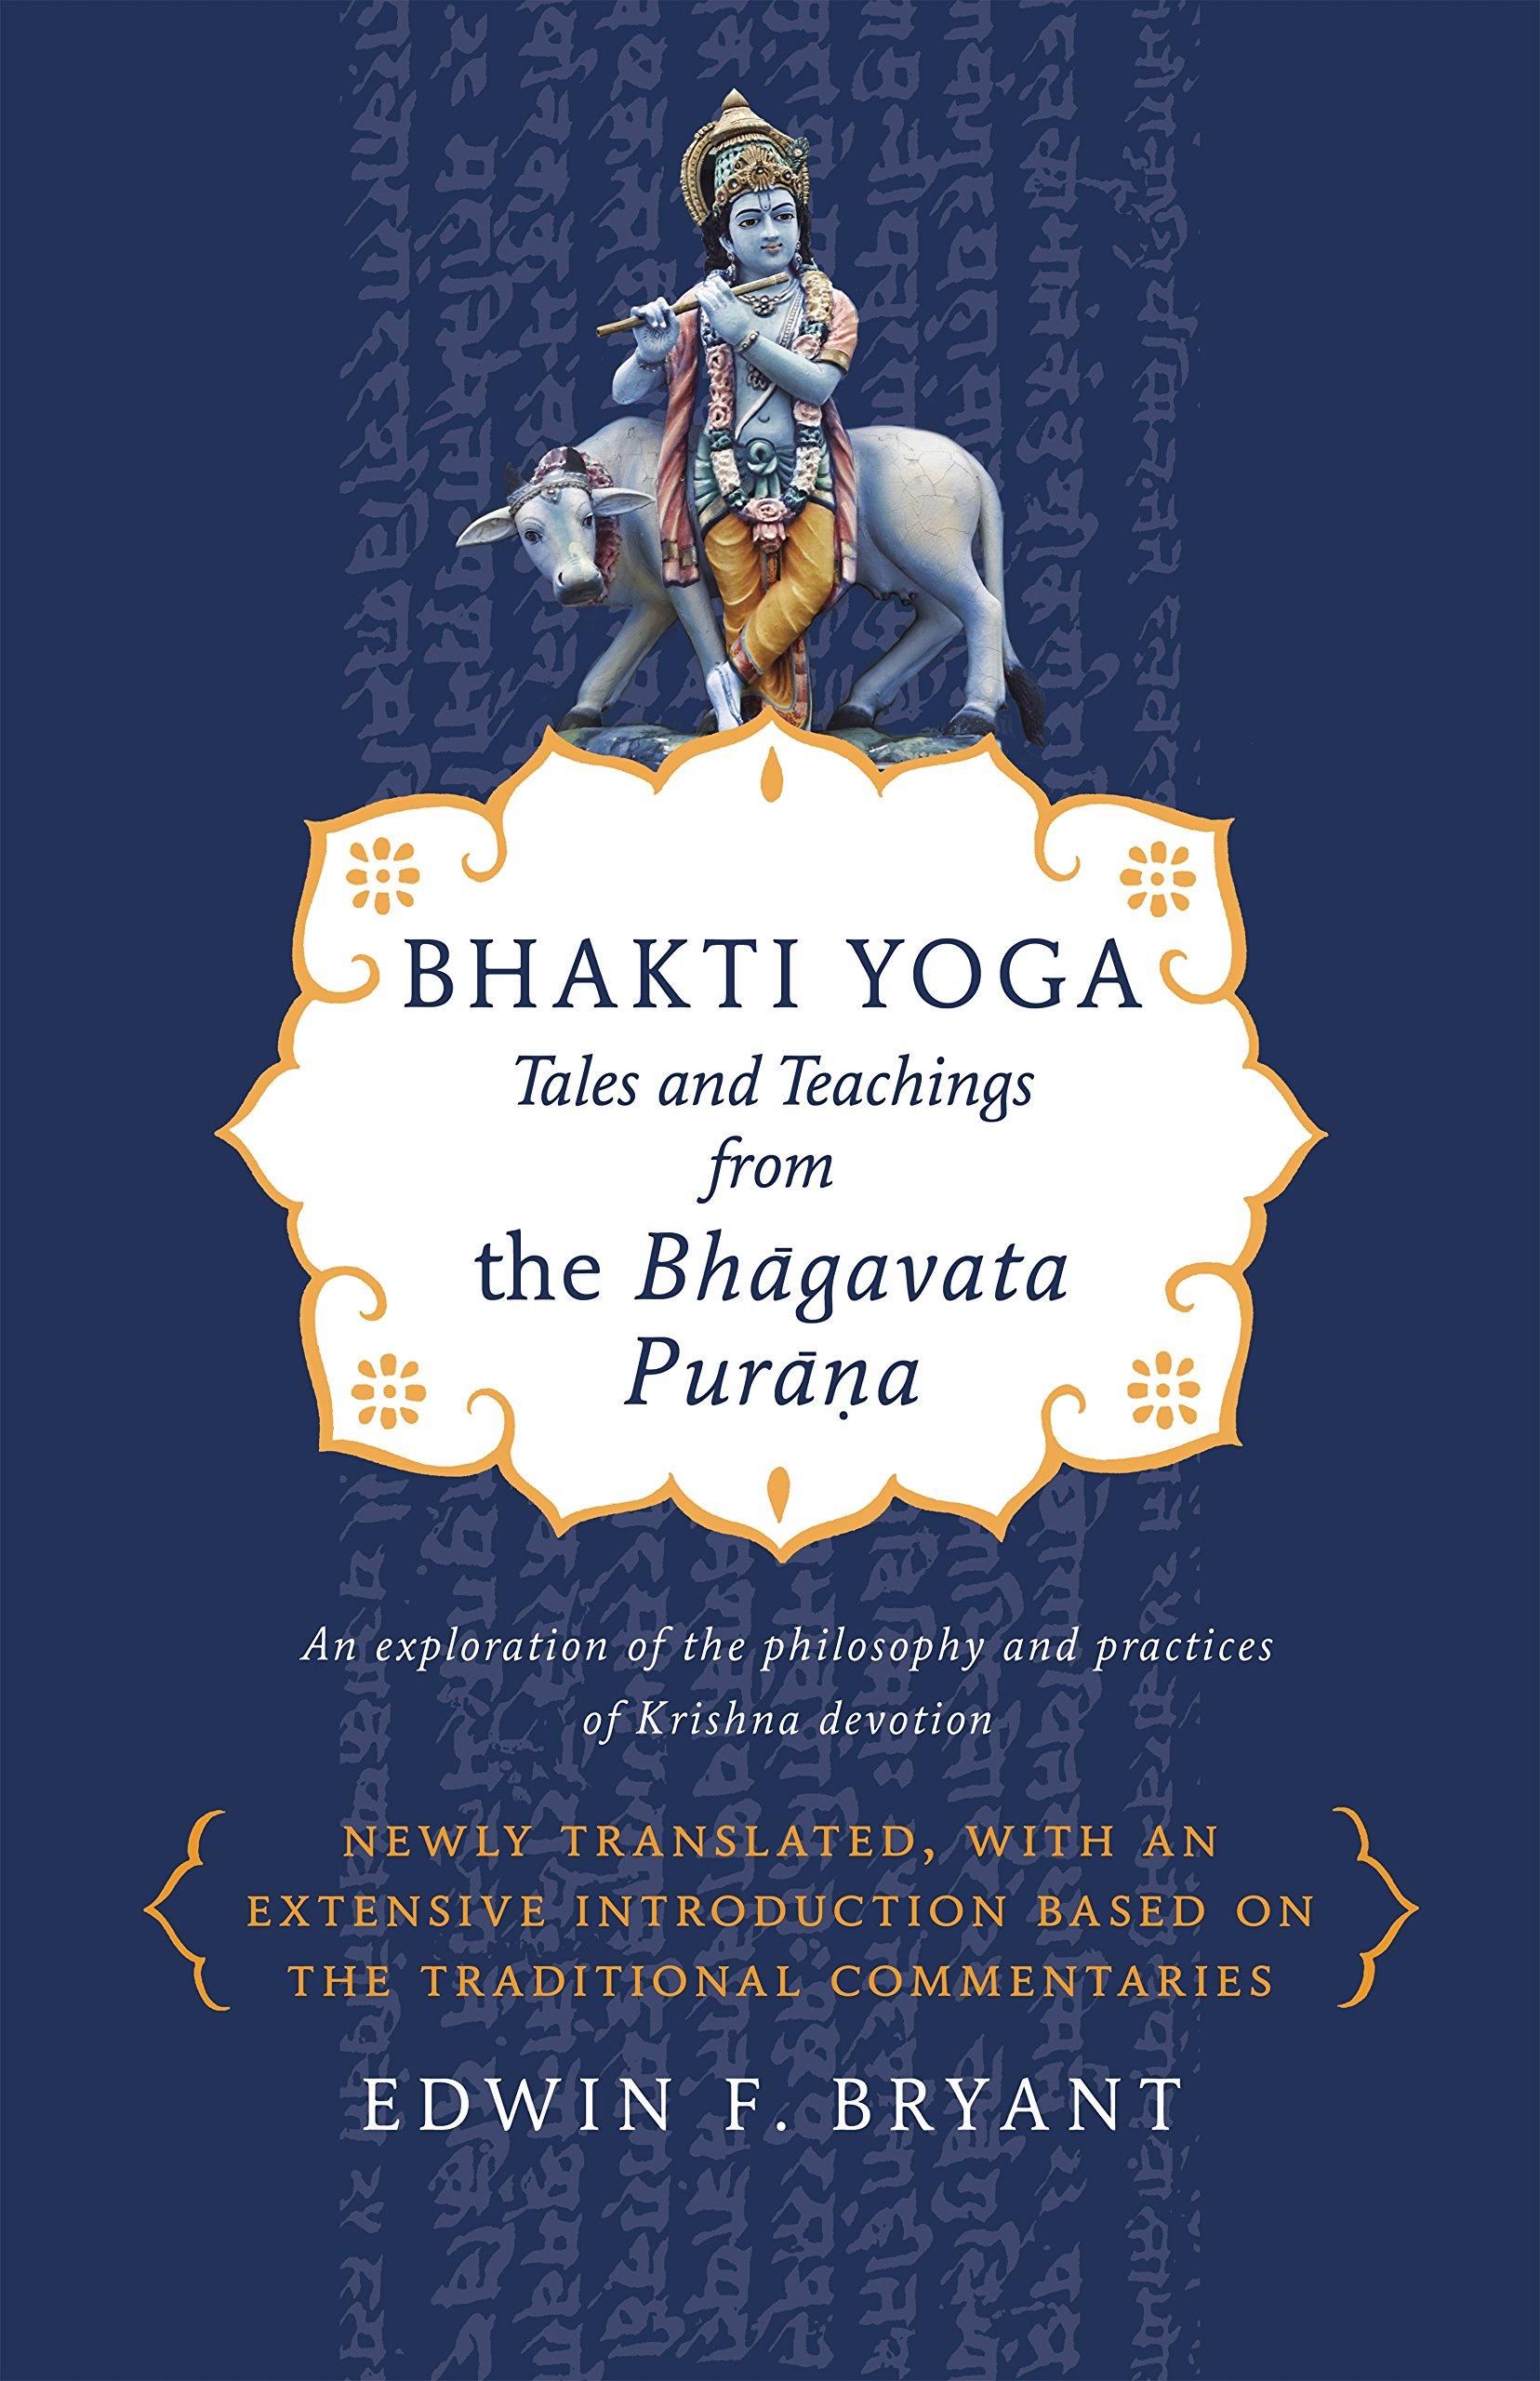 Read Online Bhakti Yoga: Tales and Teachings from the Bhagavata Purana ebook